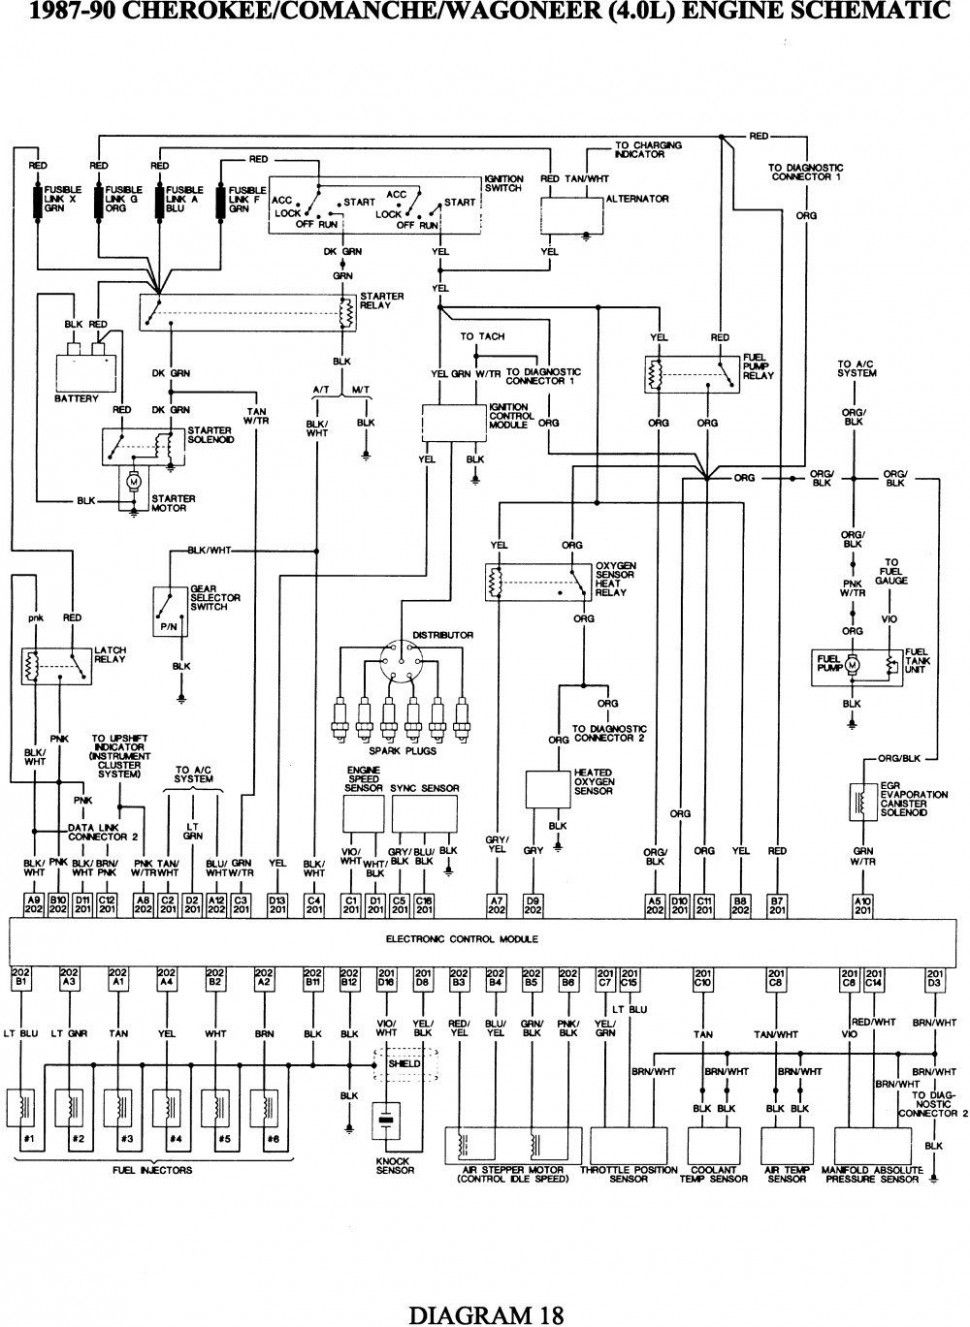 5 Jeep Wrangler 5.5 Engine Diagram 5 Jeep Wrangler 5.5 ...